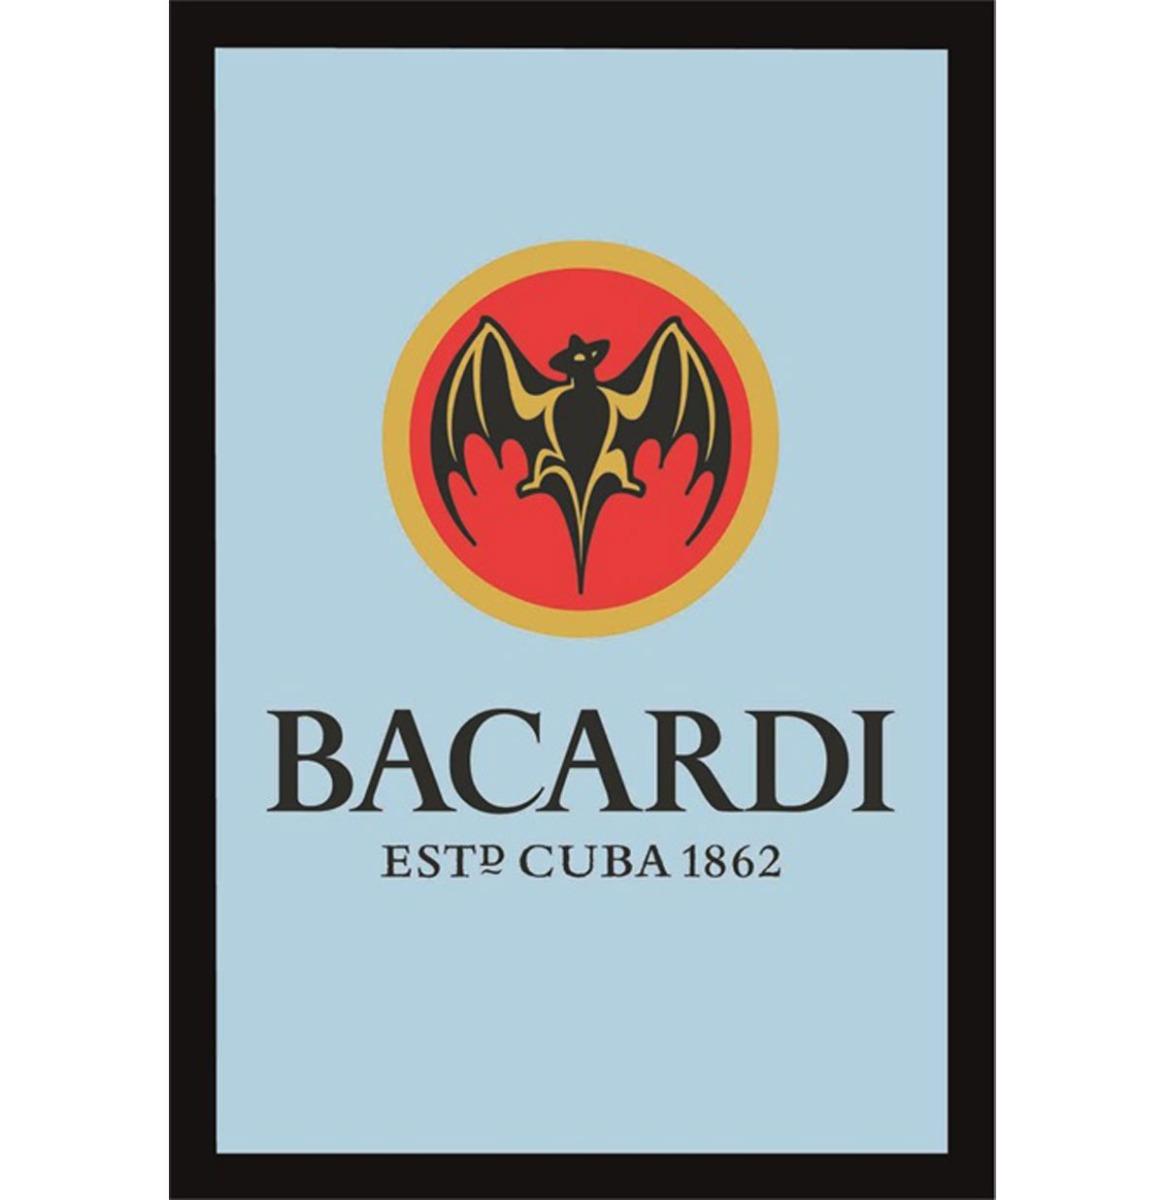 Spiegel Bacardi